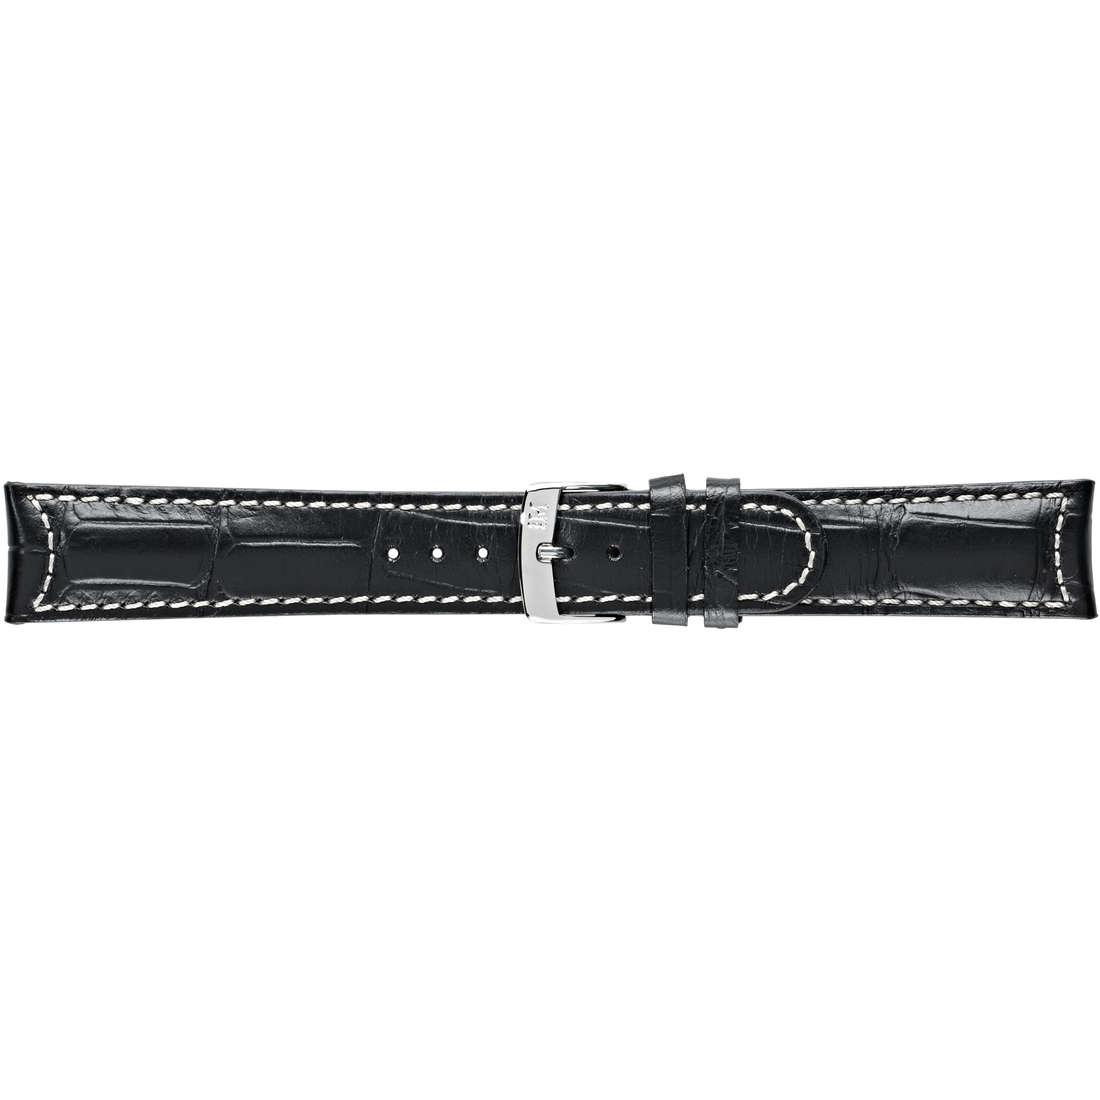 watch watch bands watch straps man Morellato Manufatti A01U3882A59019CR22